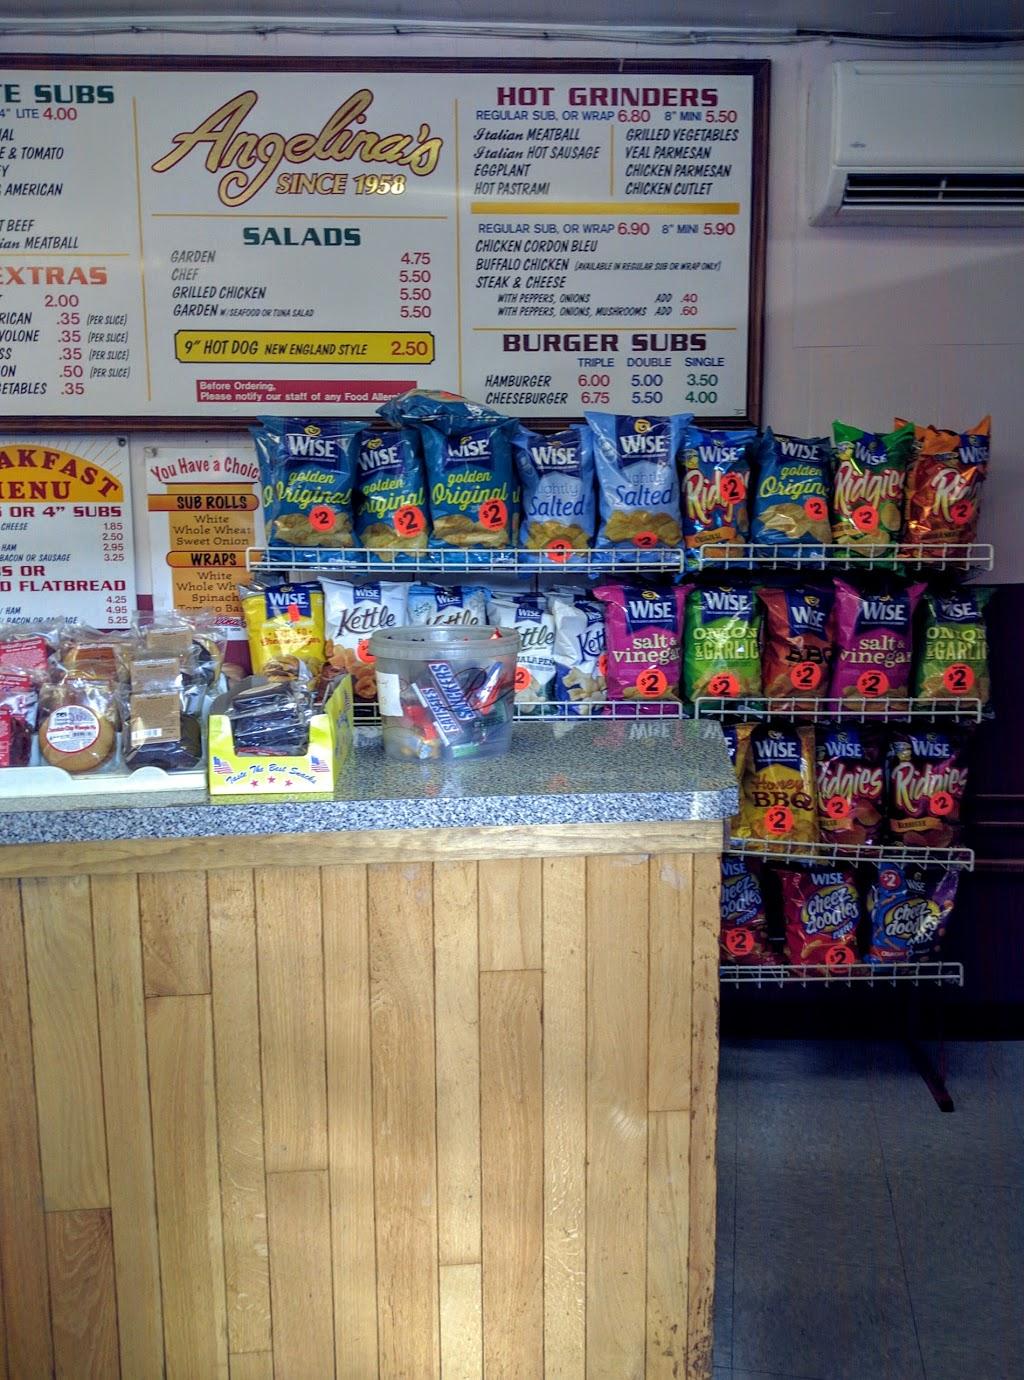 Angelinas Submarine Shop - meal takeaway  | Photo 6 of 9 | Address: 34 1/2 Columbia St, Adams, MA 01220, USA | Phone: (413) 743-9744